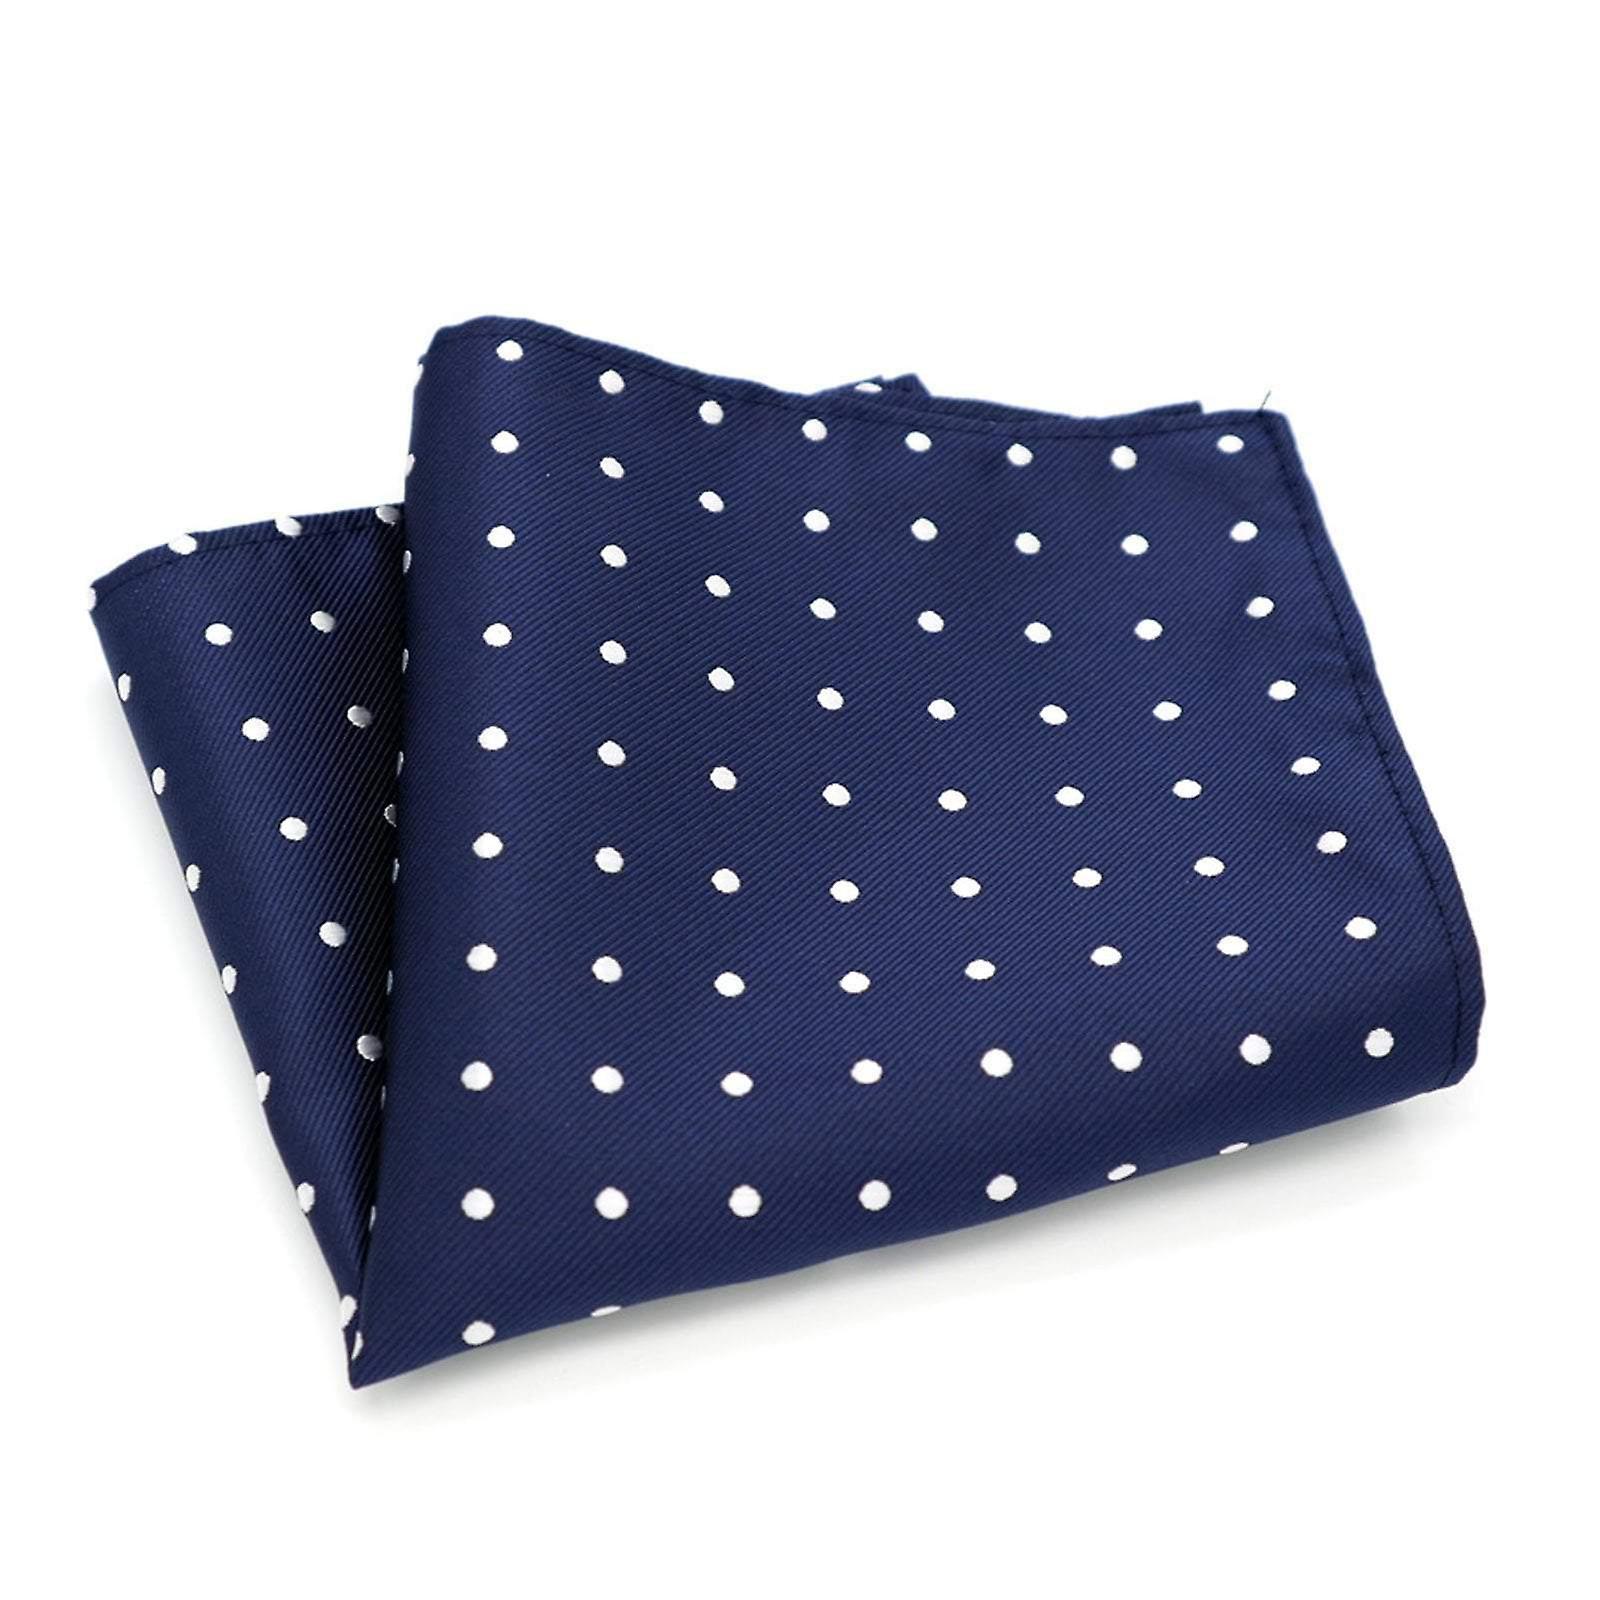 Navy blue & white polka dot interview tie & hanky set